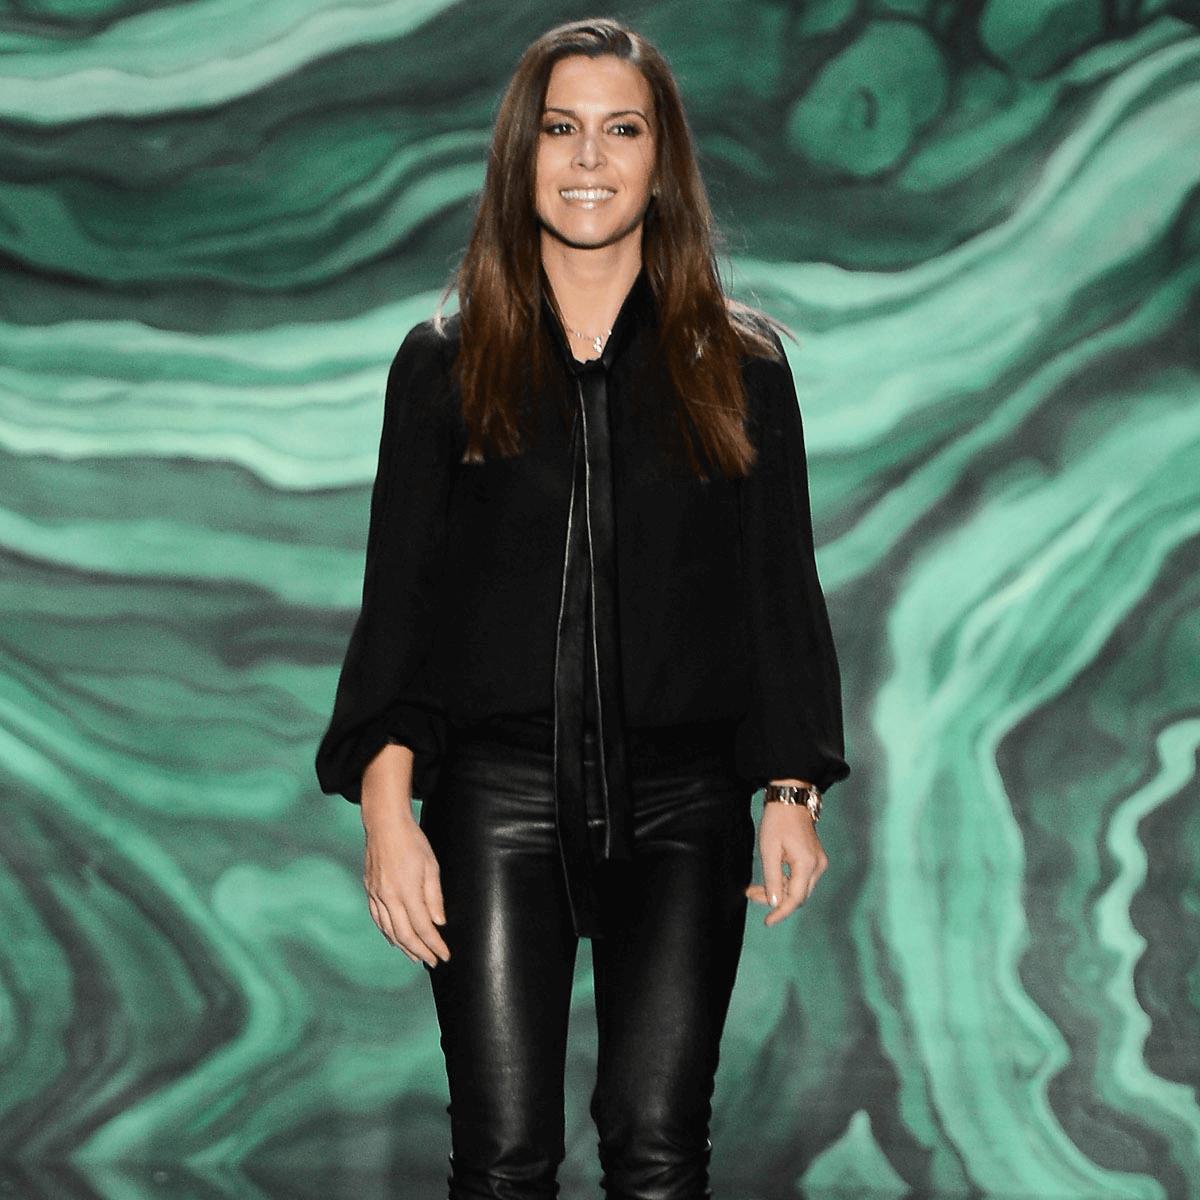 Fashion Week fall 2013, designer Monique Lhuillier